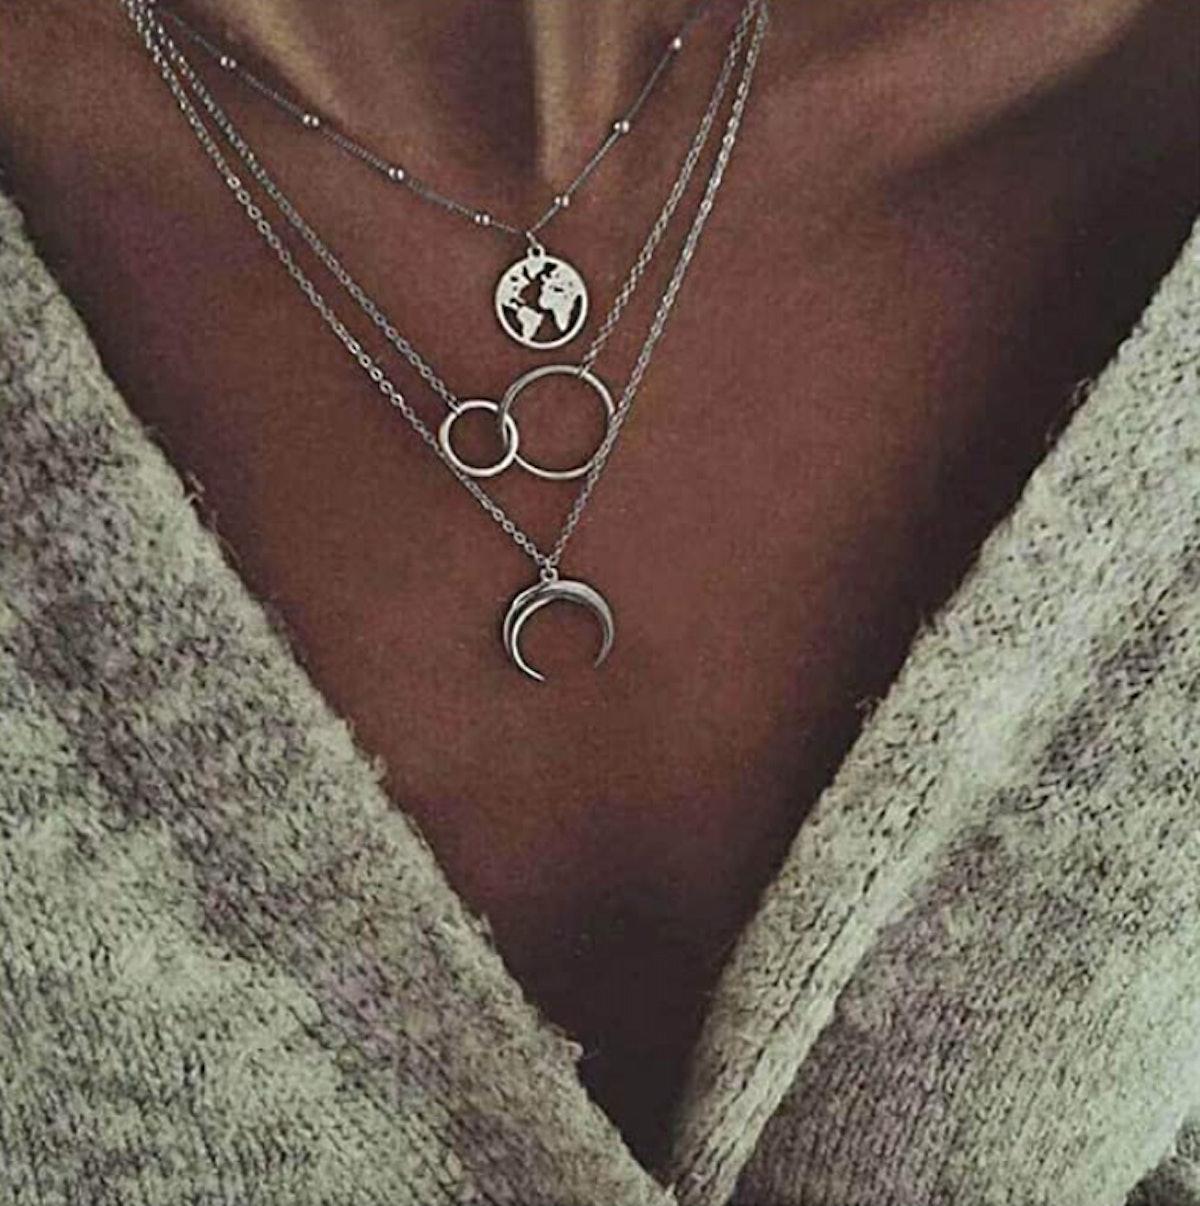 Edary Layered Necklace